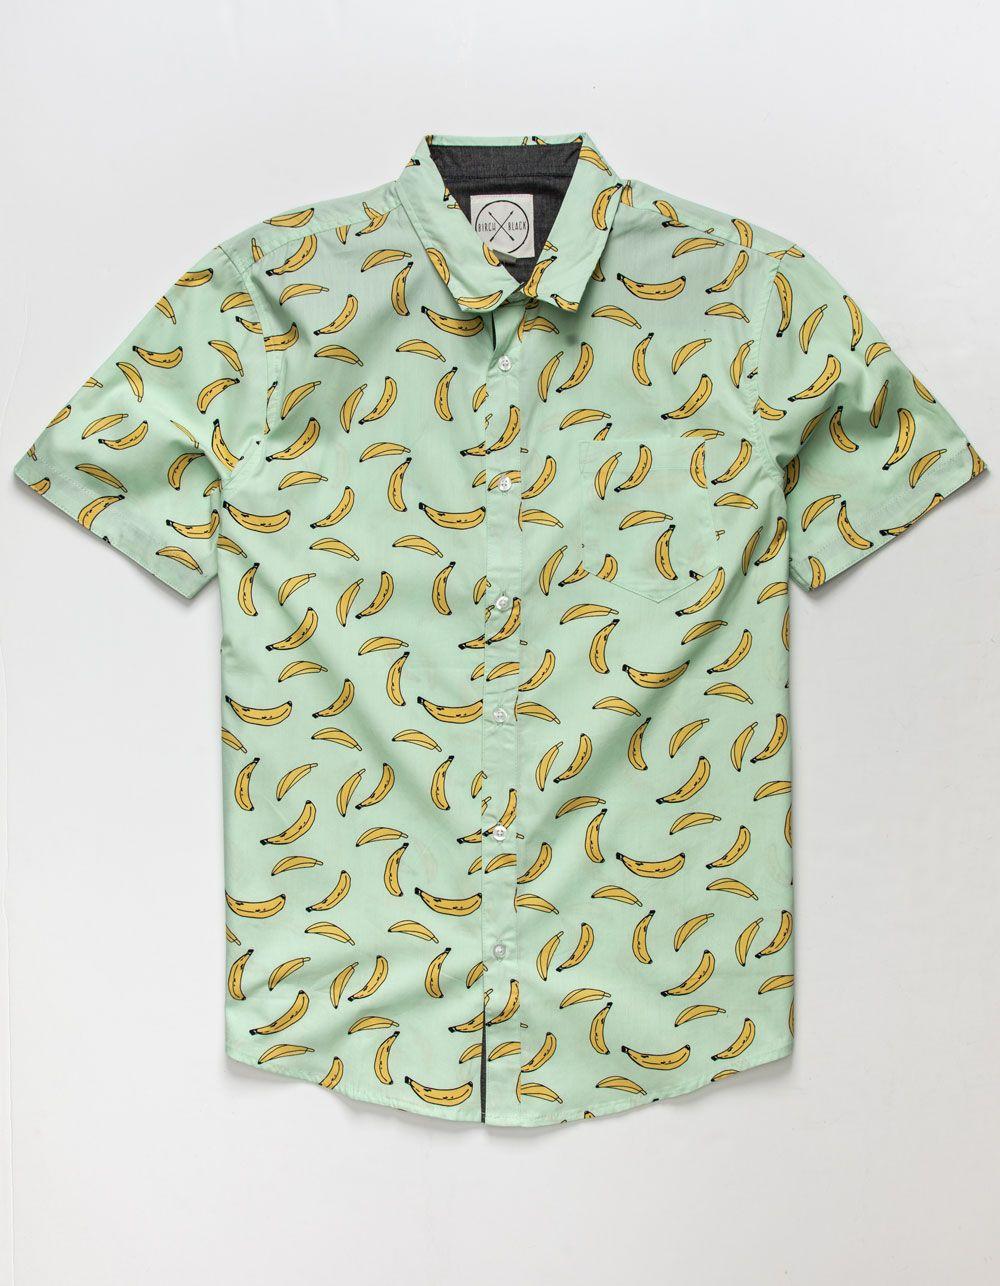 Birch Black Bananas Mens Button Up Shirt Jade 366393509 Mens Button Up Button Up Shirts Mens Printed Shirts